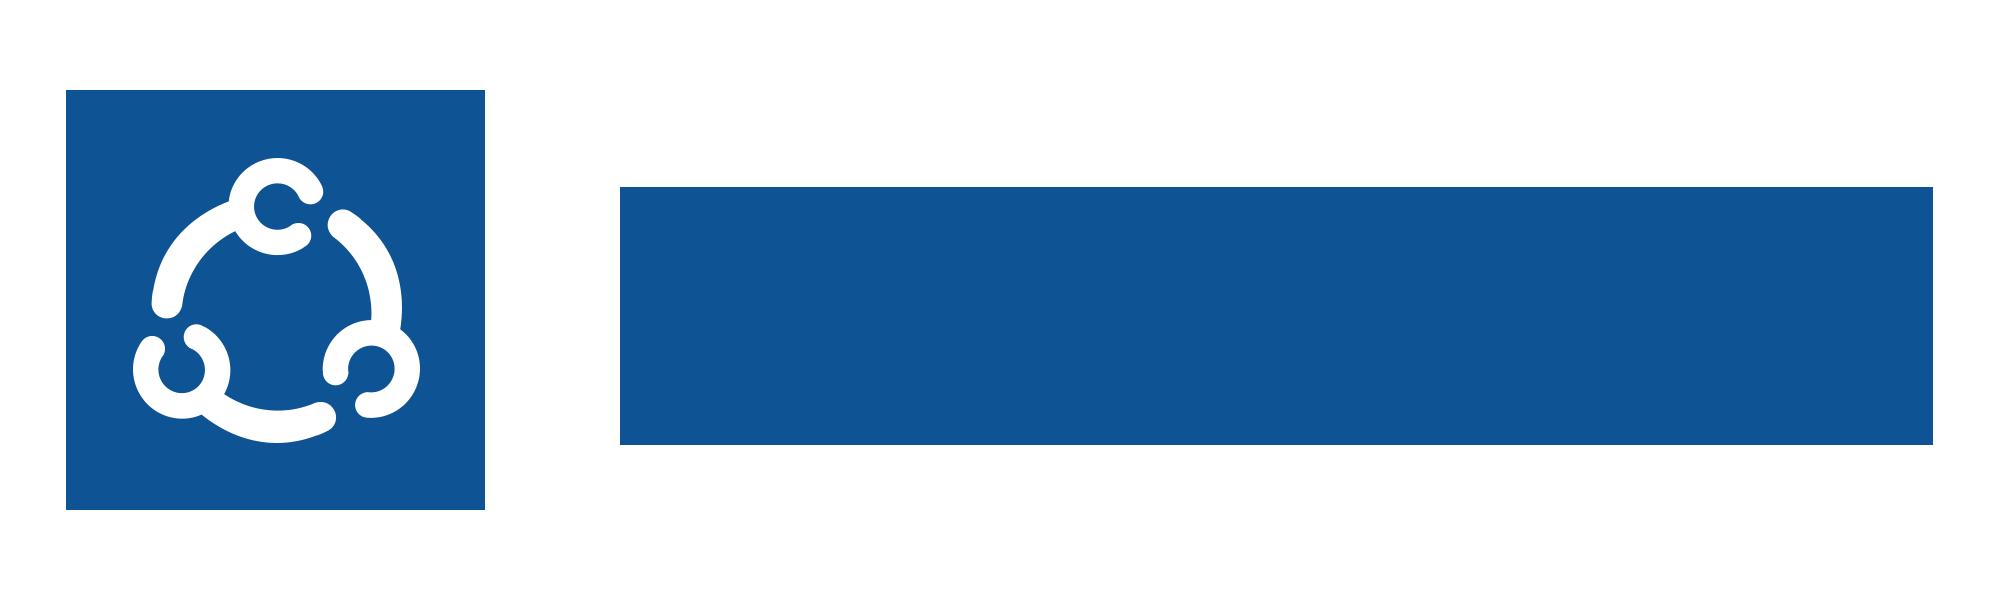 Richpanel